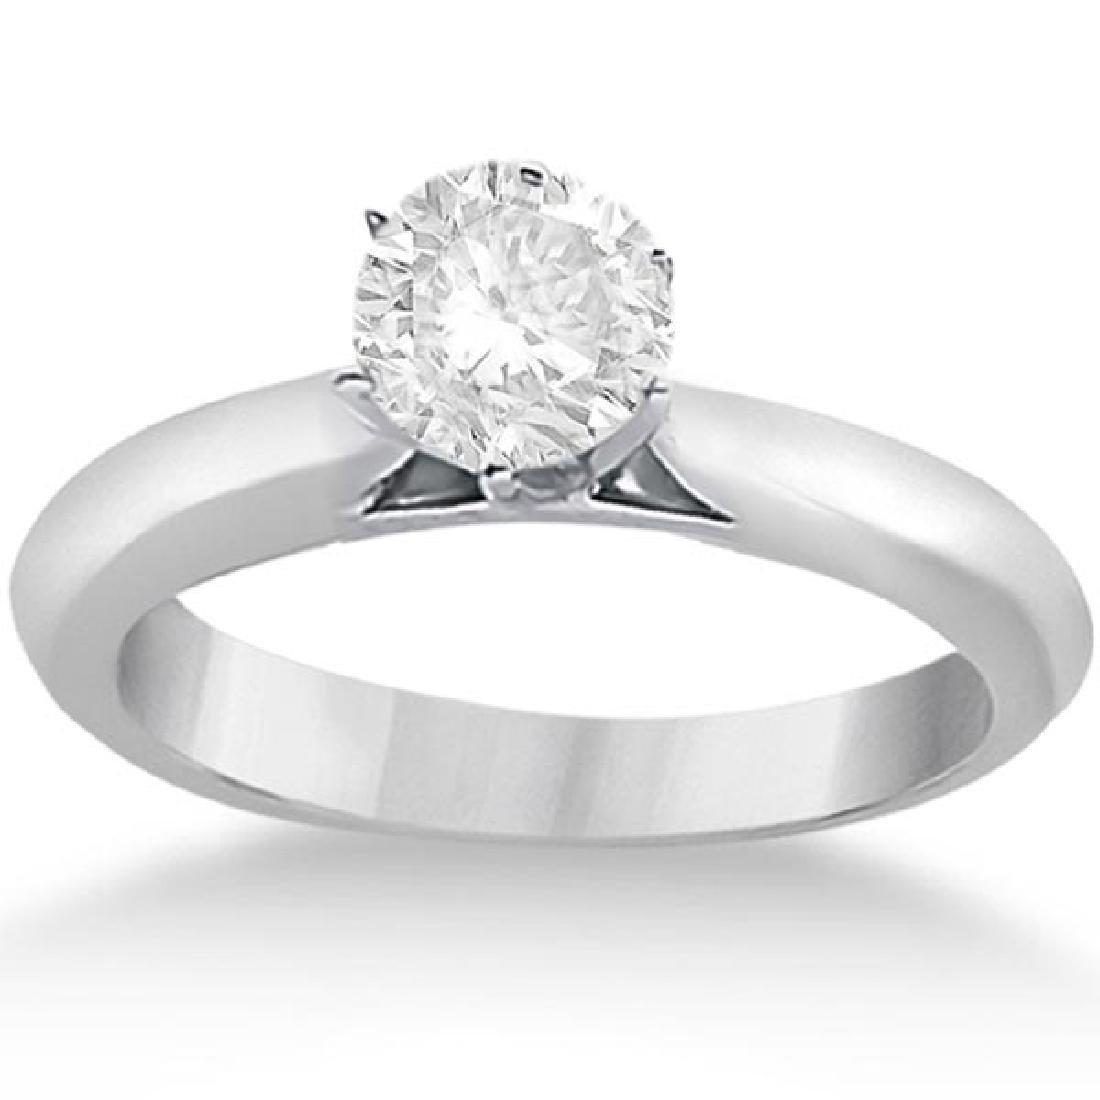 Six-Prong 14k White Gold Solitaire Engagement Ring Sett